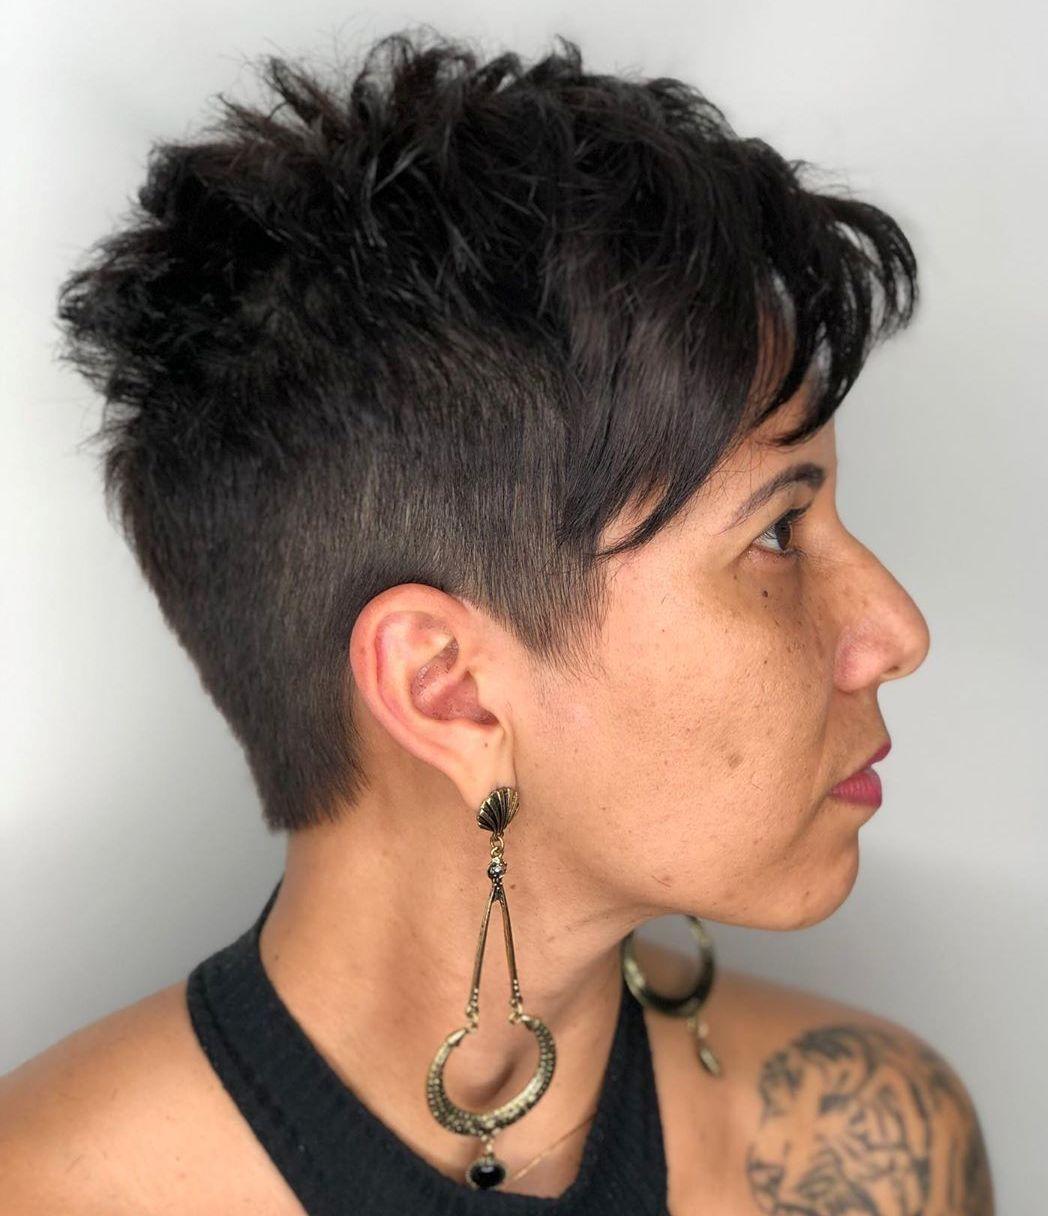 Very Short Choppy Cut with Bangs